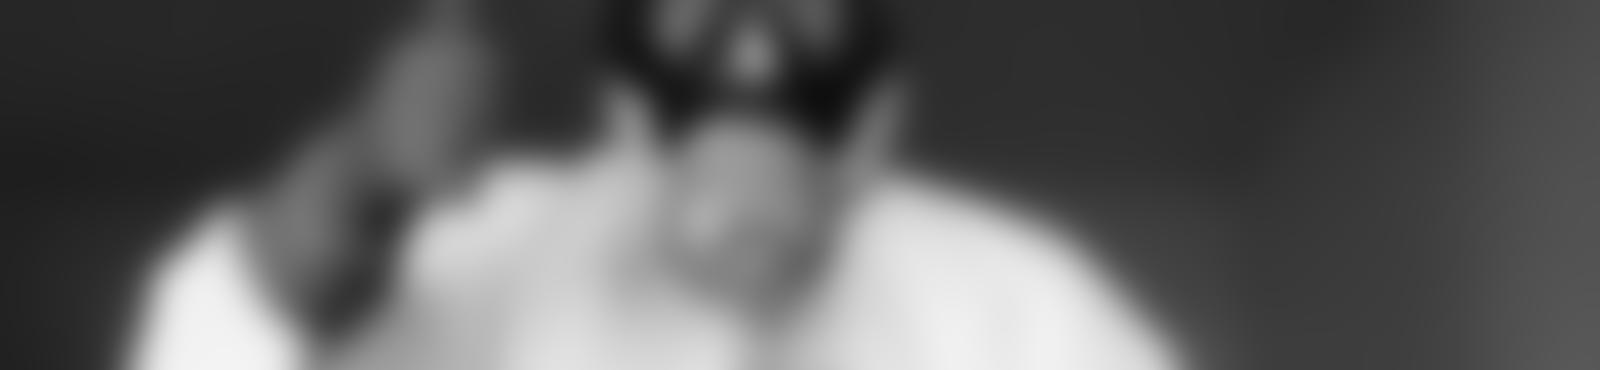 Blurred 2081753a 5a17 48c4 8bcd f088b2bd1ec8